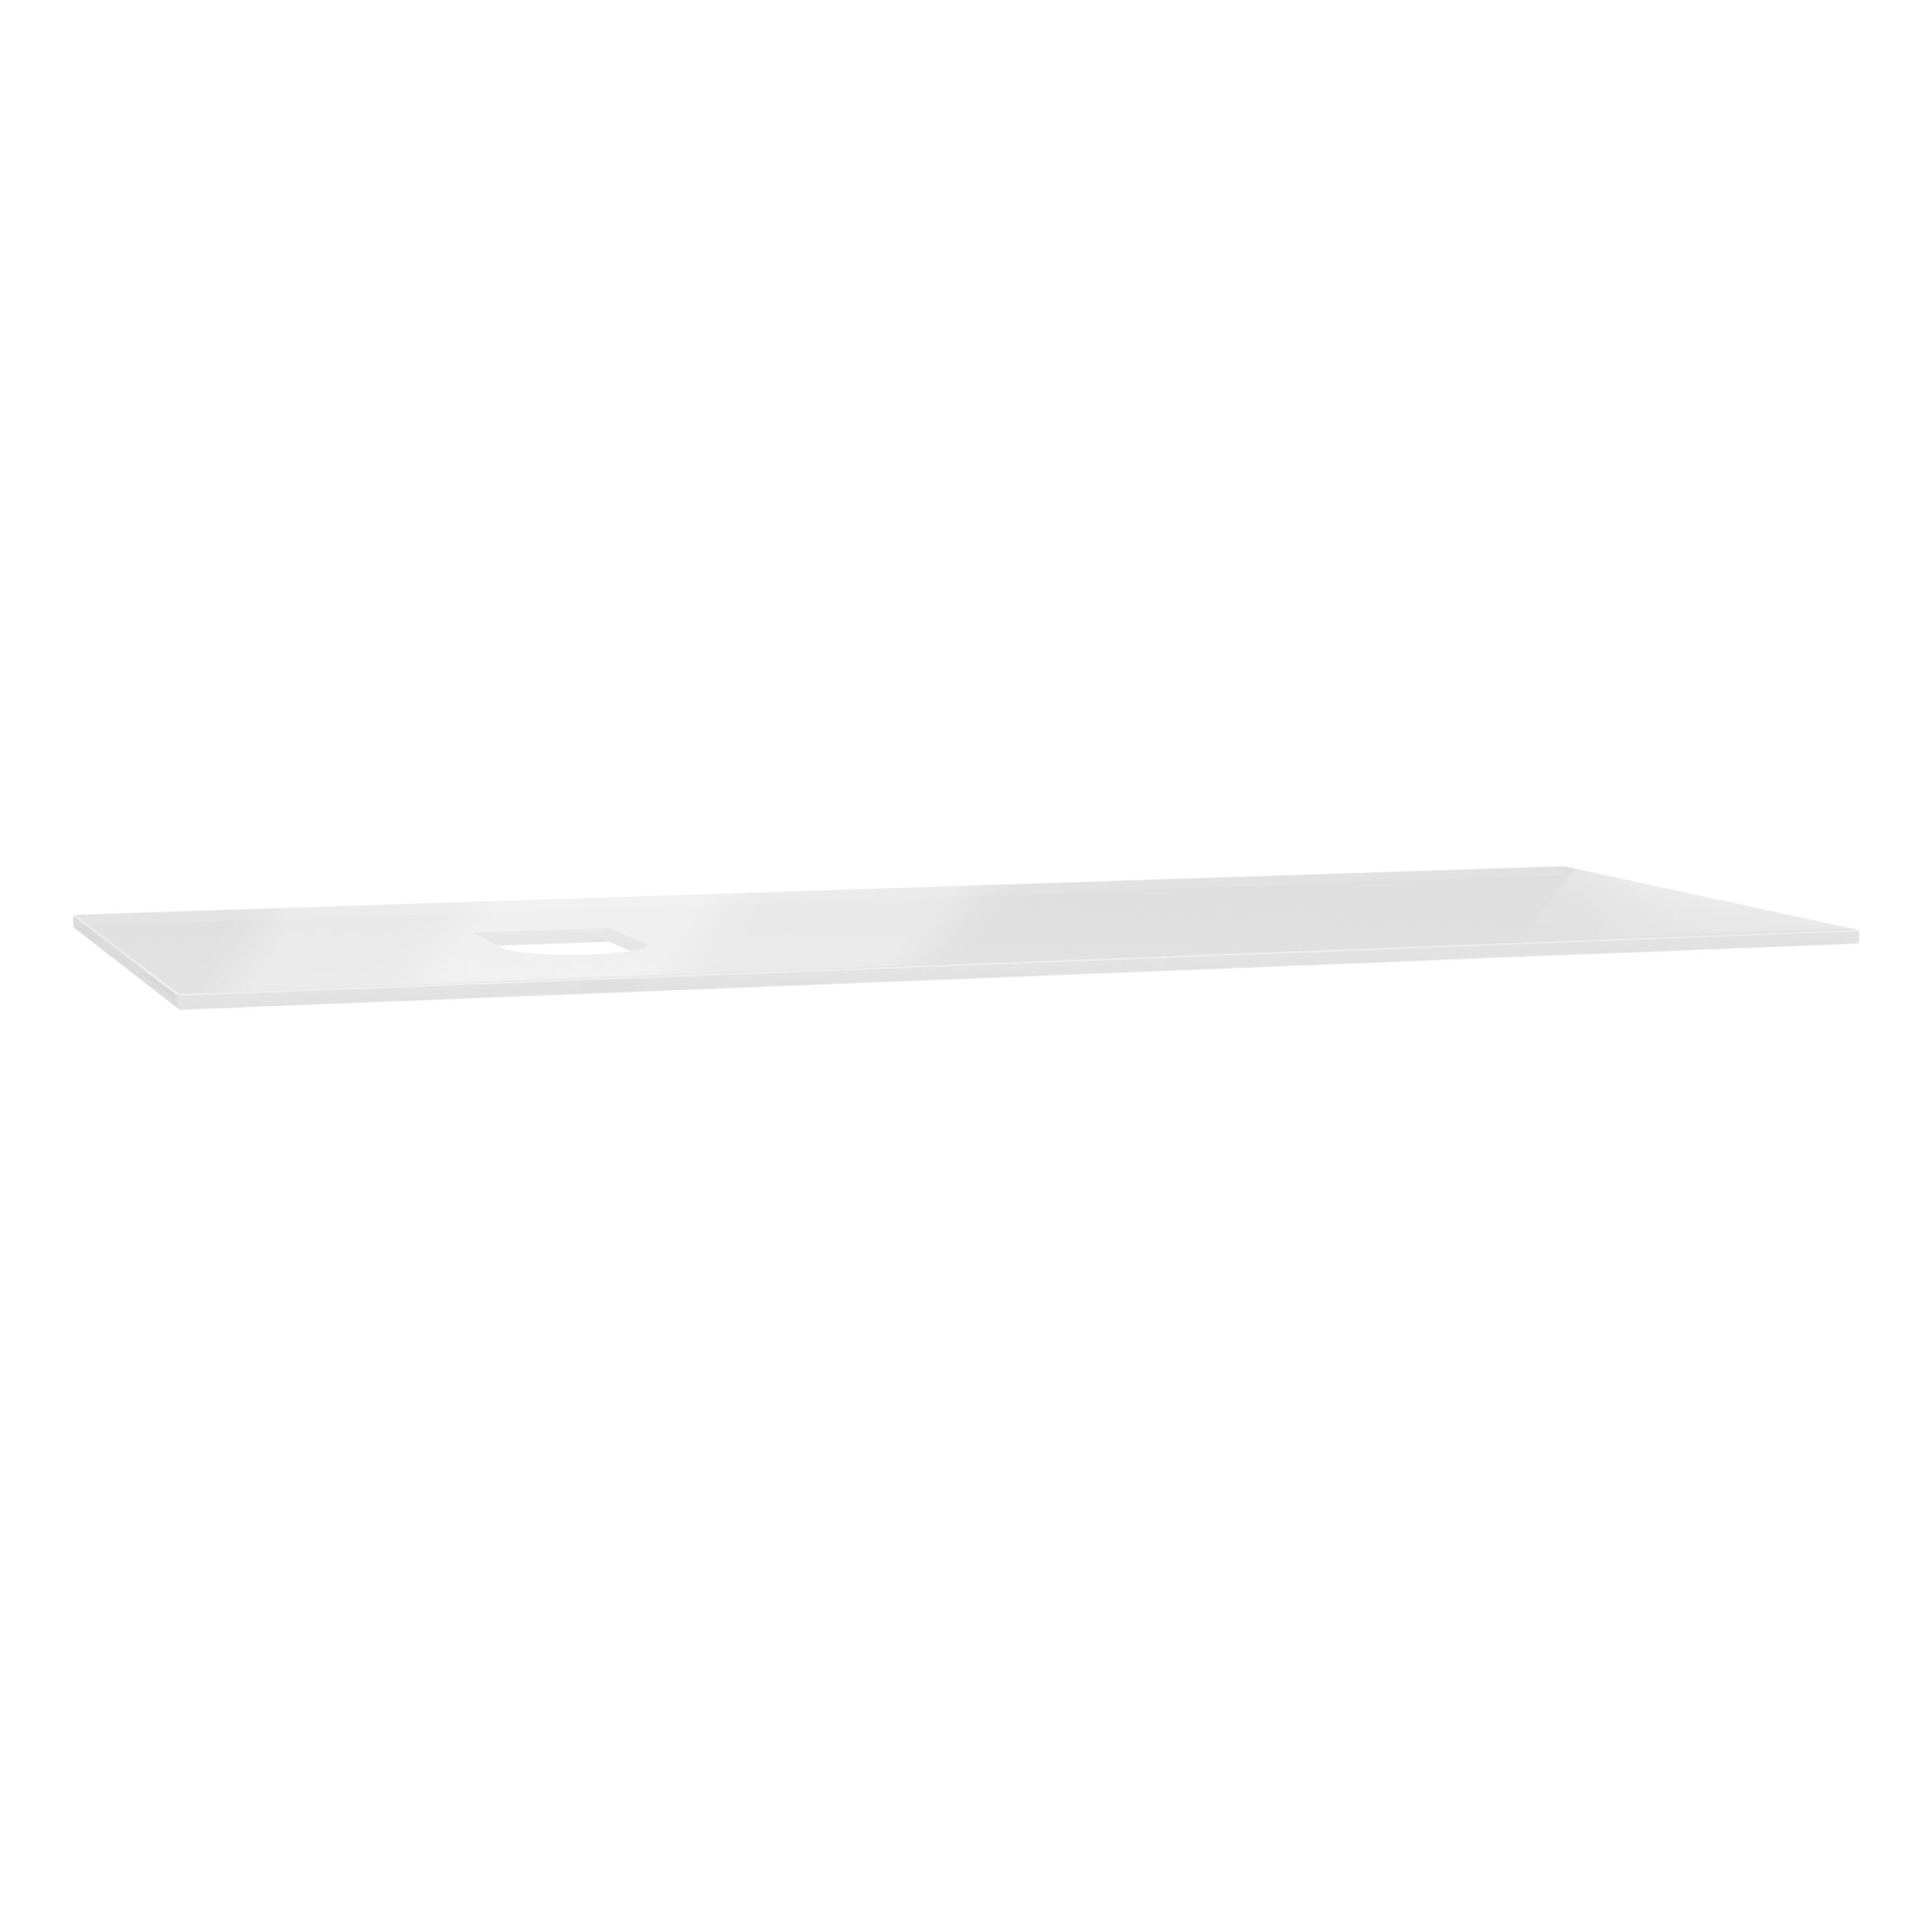 Origin plan de toilette, 120 cm, verre blanc, gauche